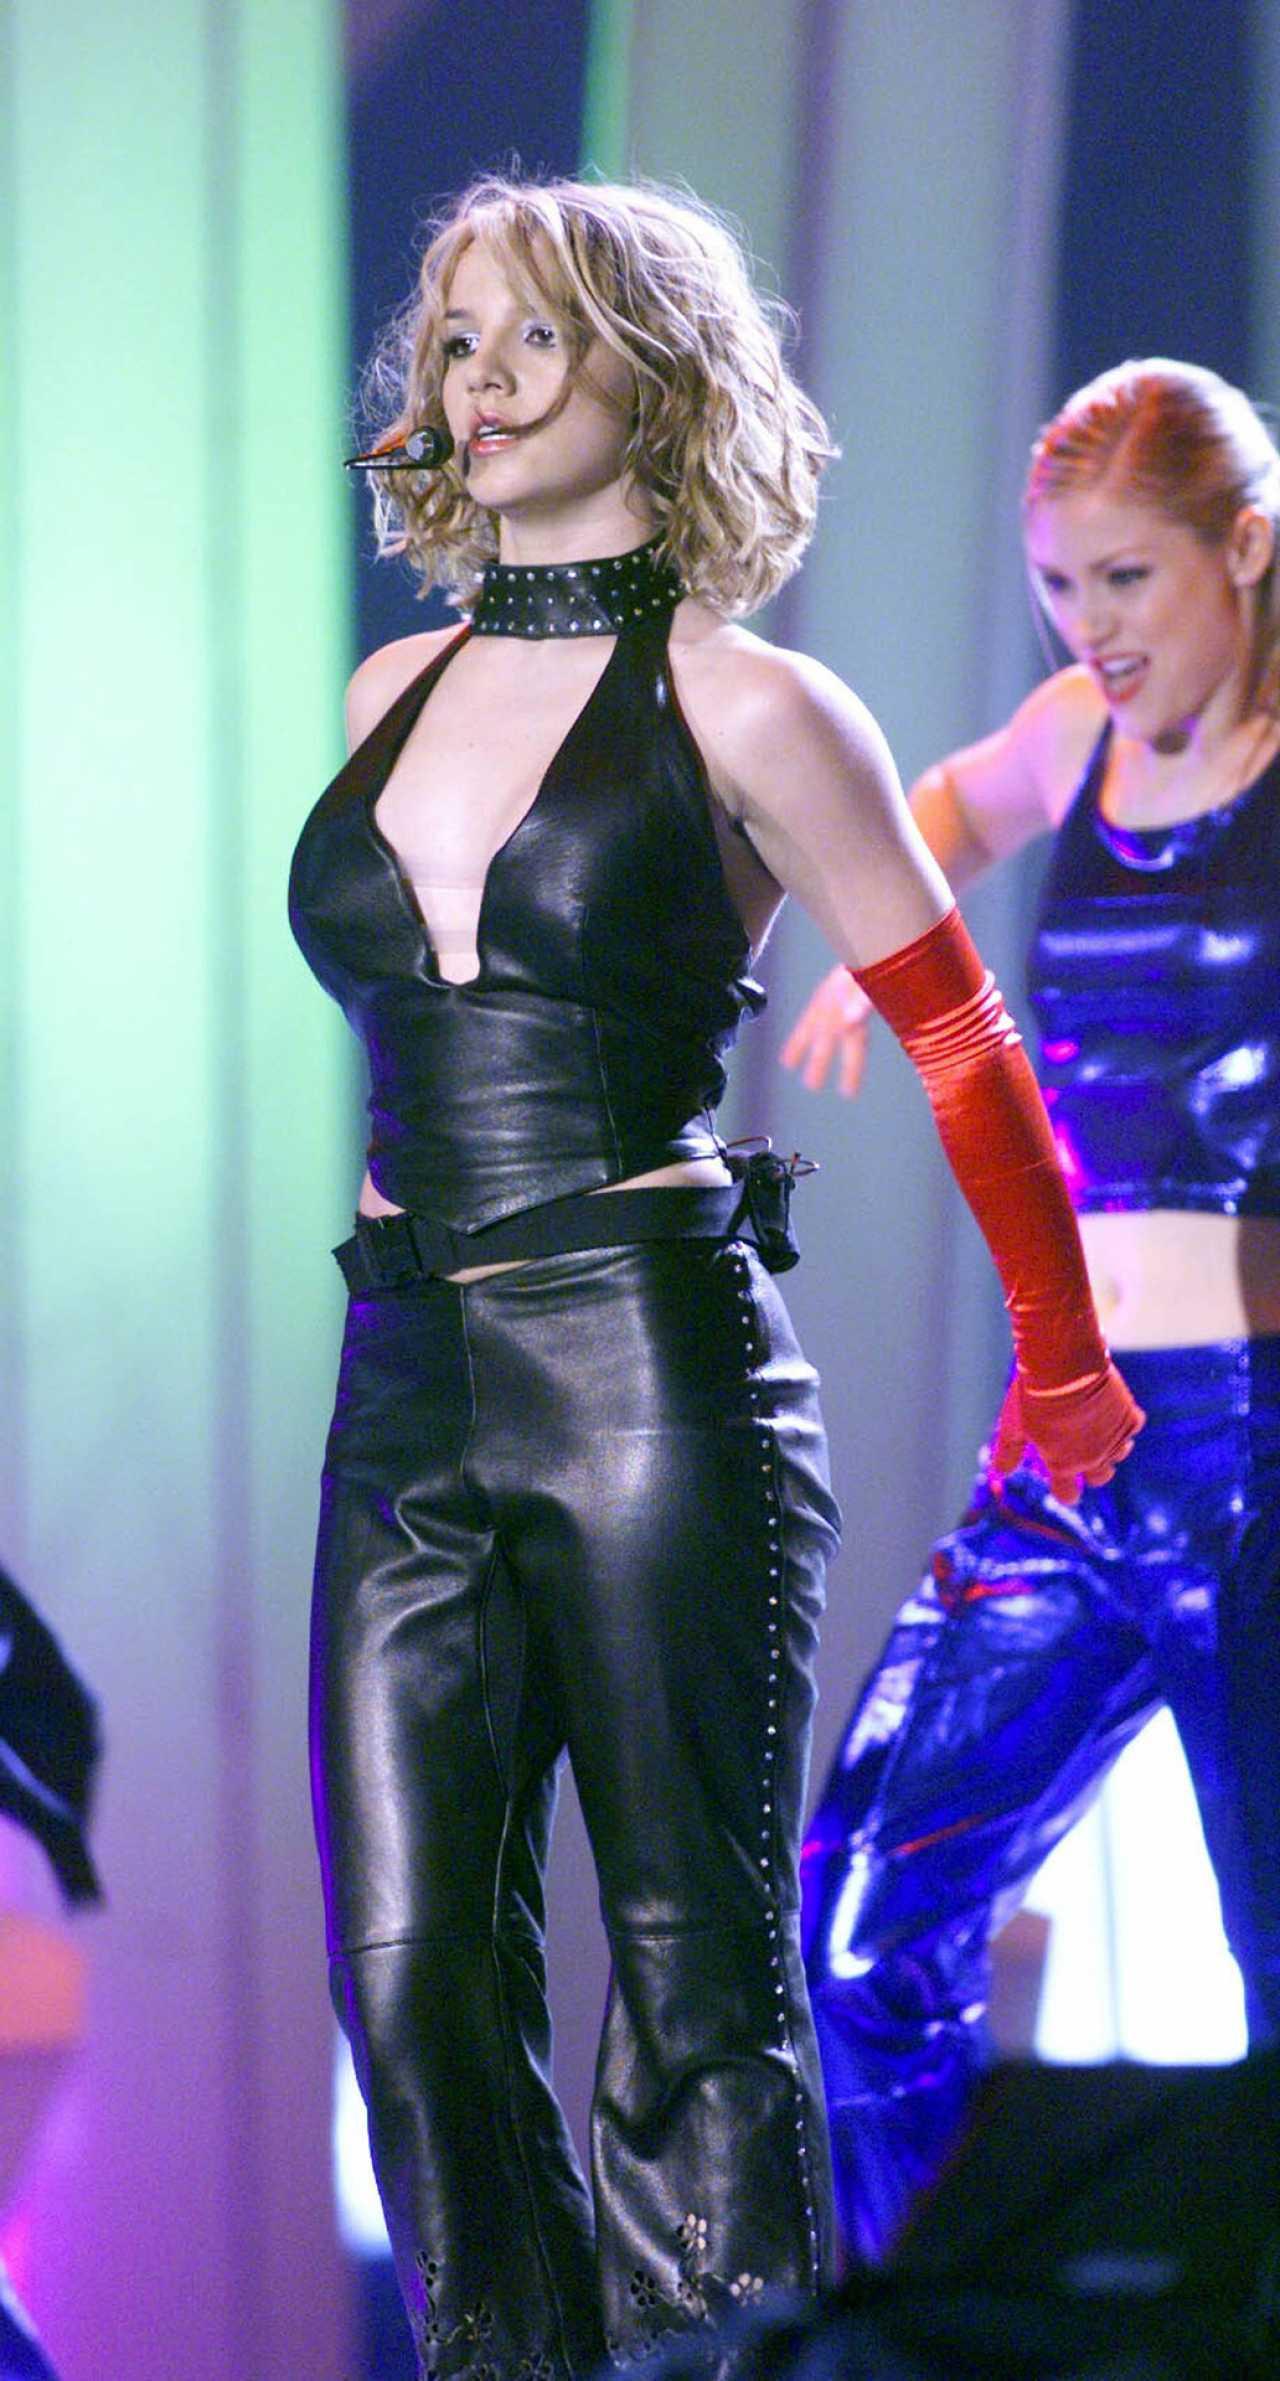 Celebrity Fashionista | Britney Spears: Instagram May 24